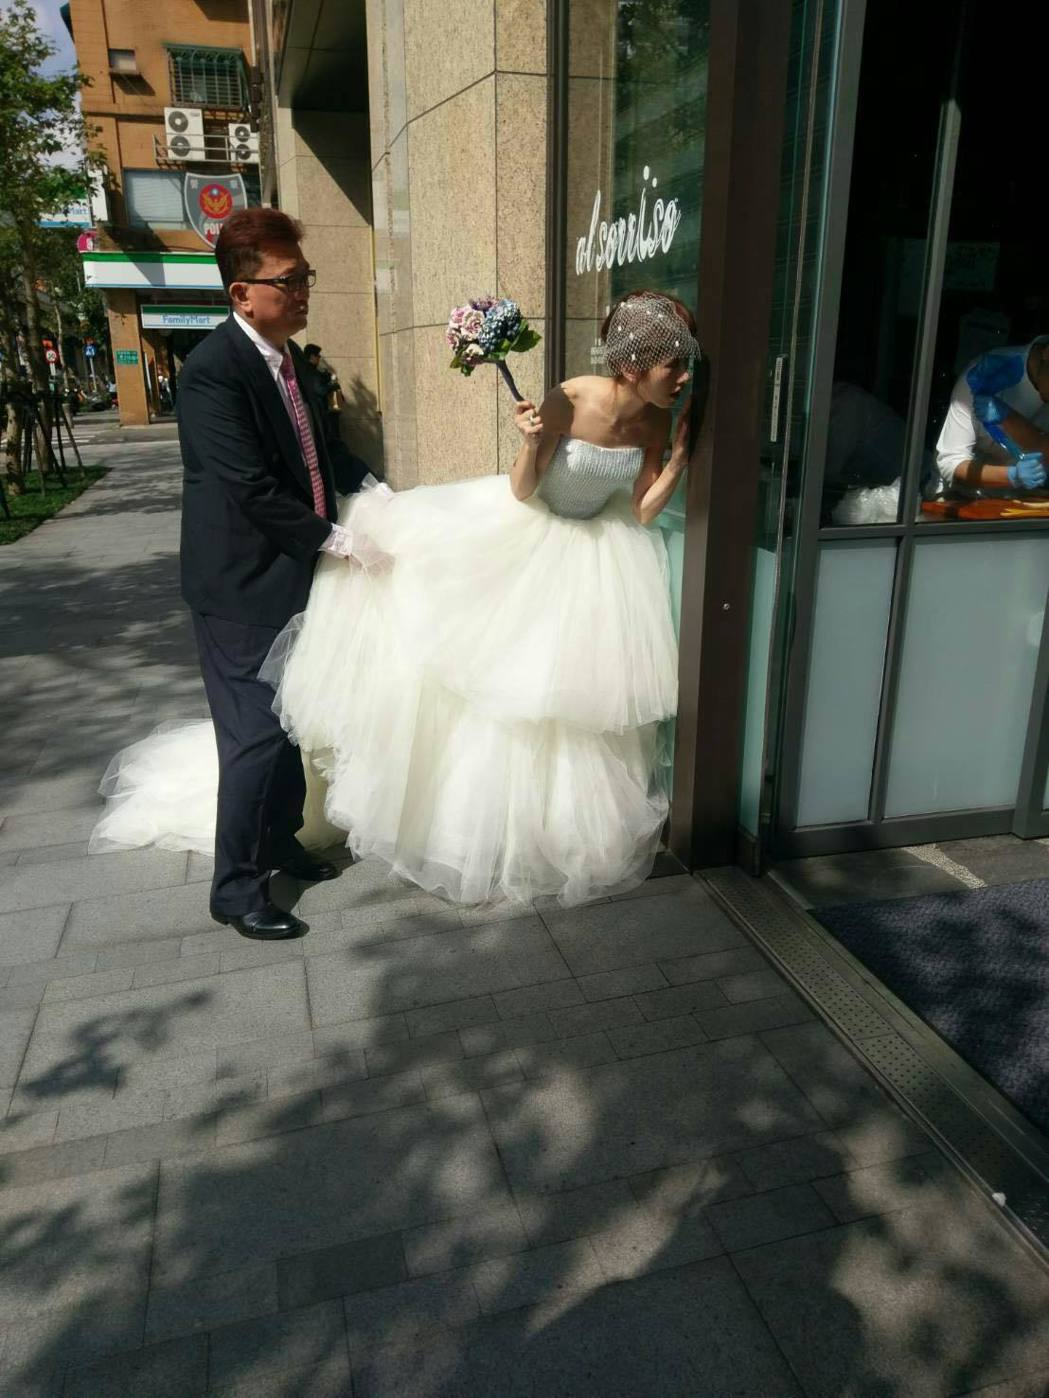 Lulu打扮成新娘造型,與爸爸一同參加UNT代言活動,進場時還不改俏皮本性。圖/...